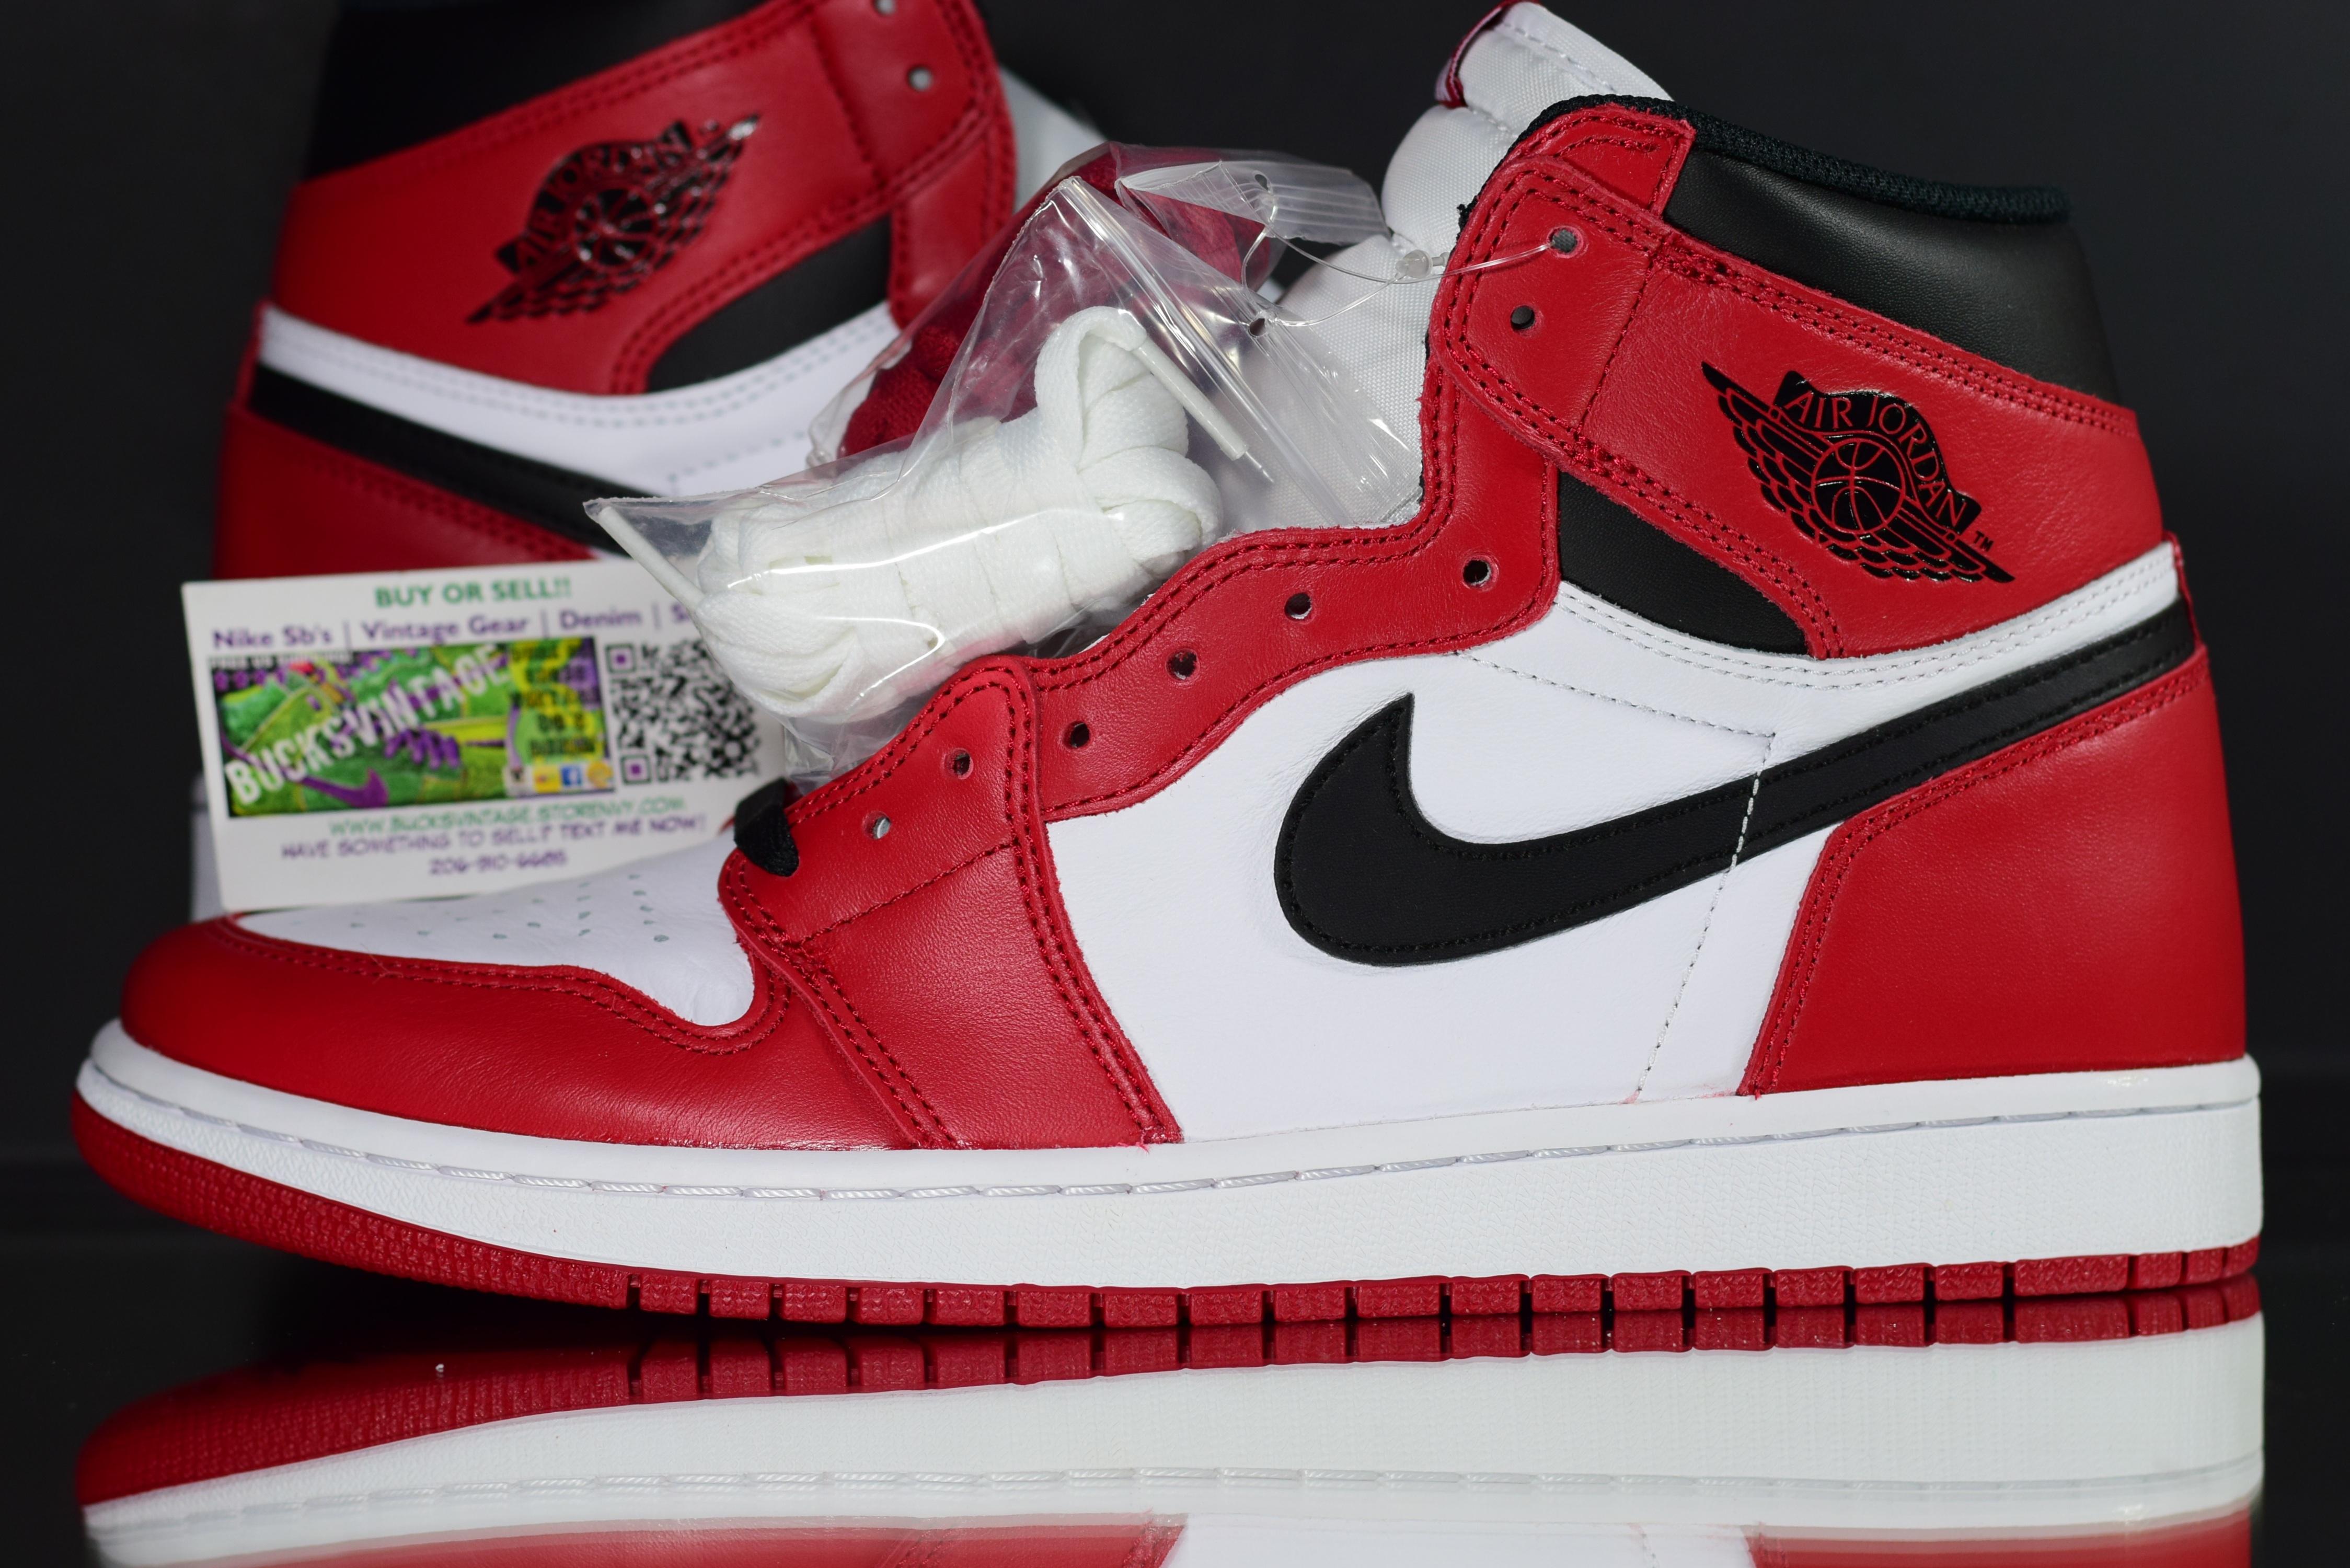 online store a3c1b 765a5 Size 11.5   2015 Nike Air Jordan 1 Retro OG CHICAGO · BucksVintage .